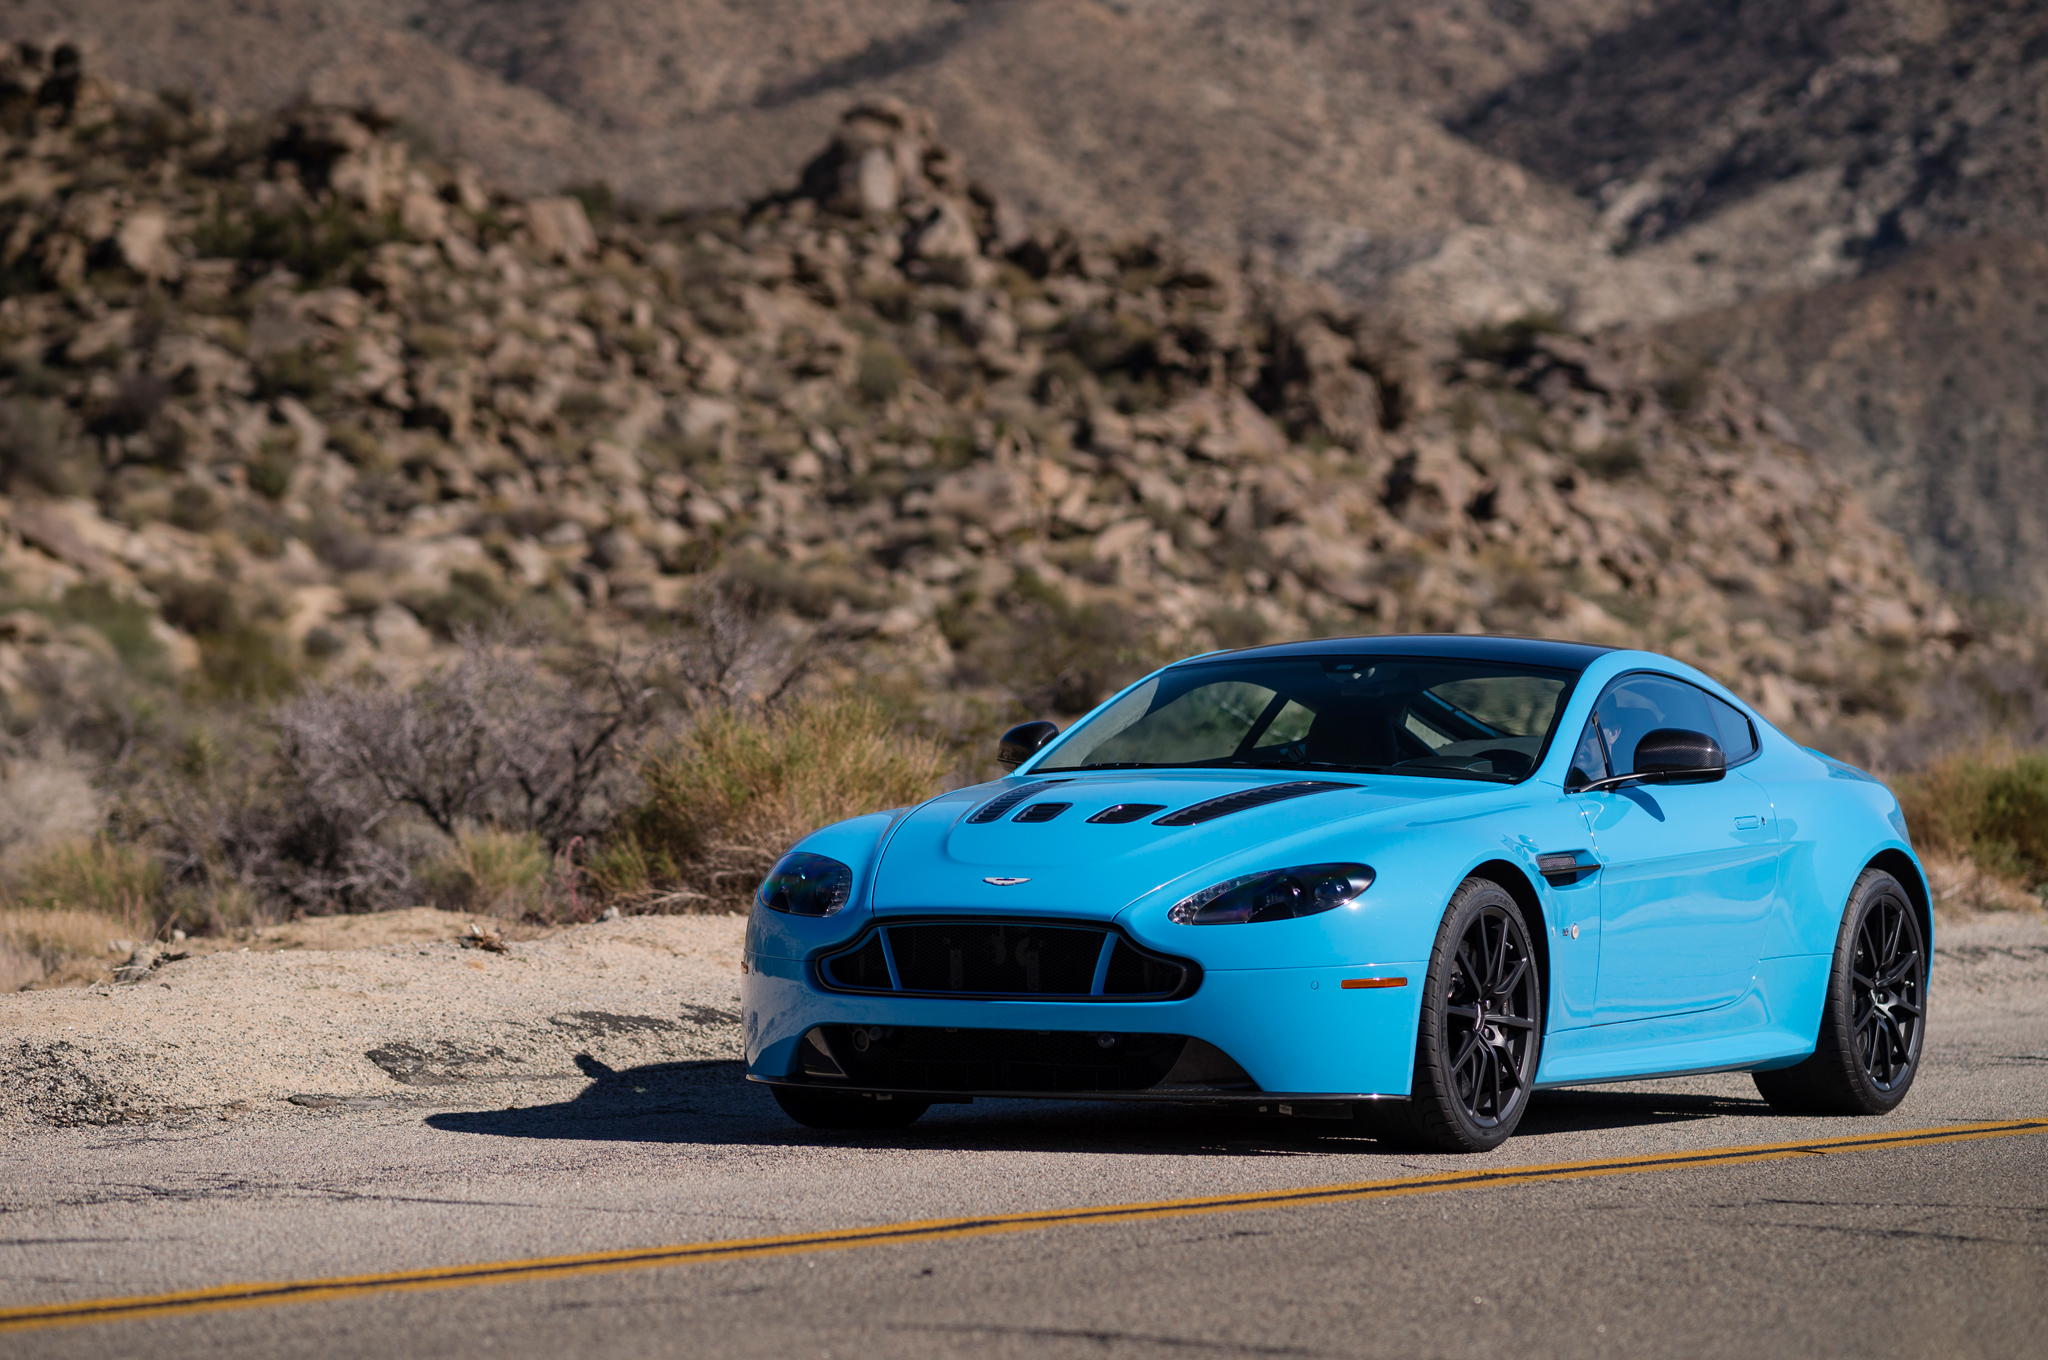 2015 Aston Martin V12 Vantage S Image 9